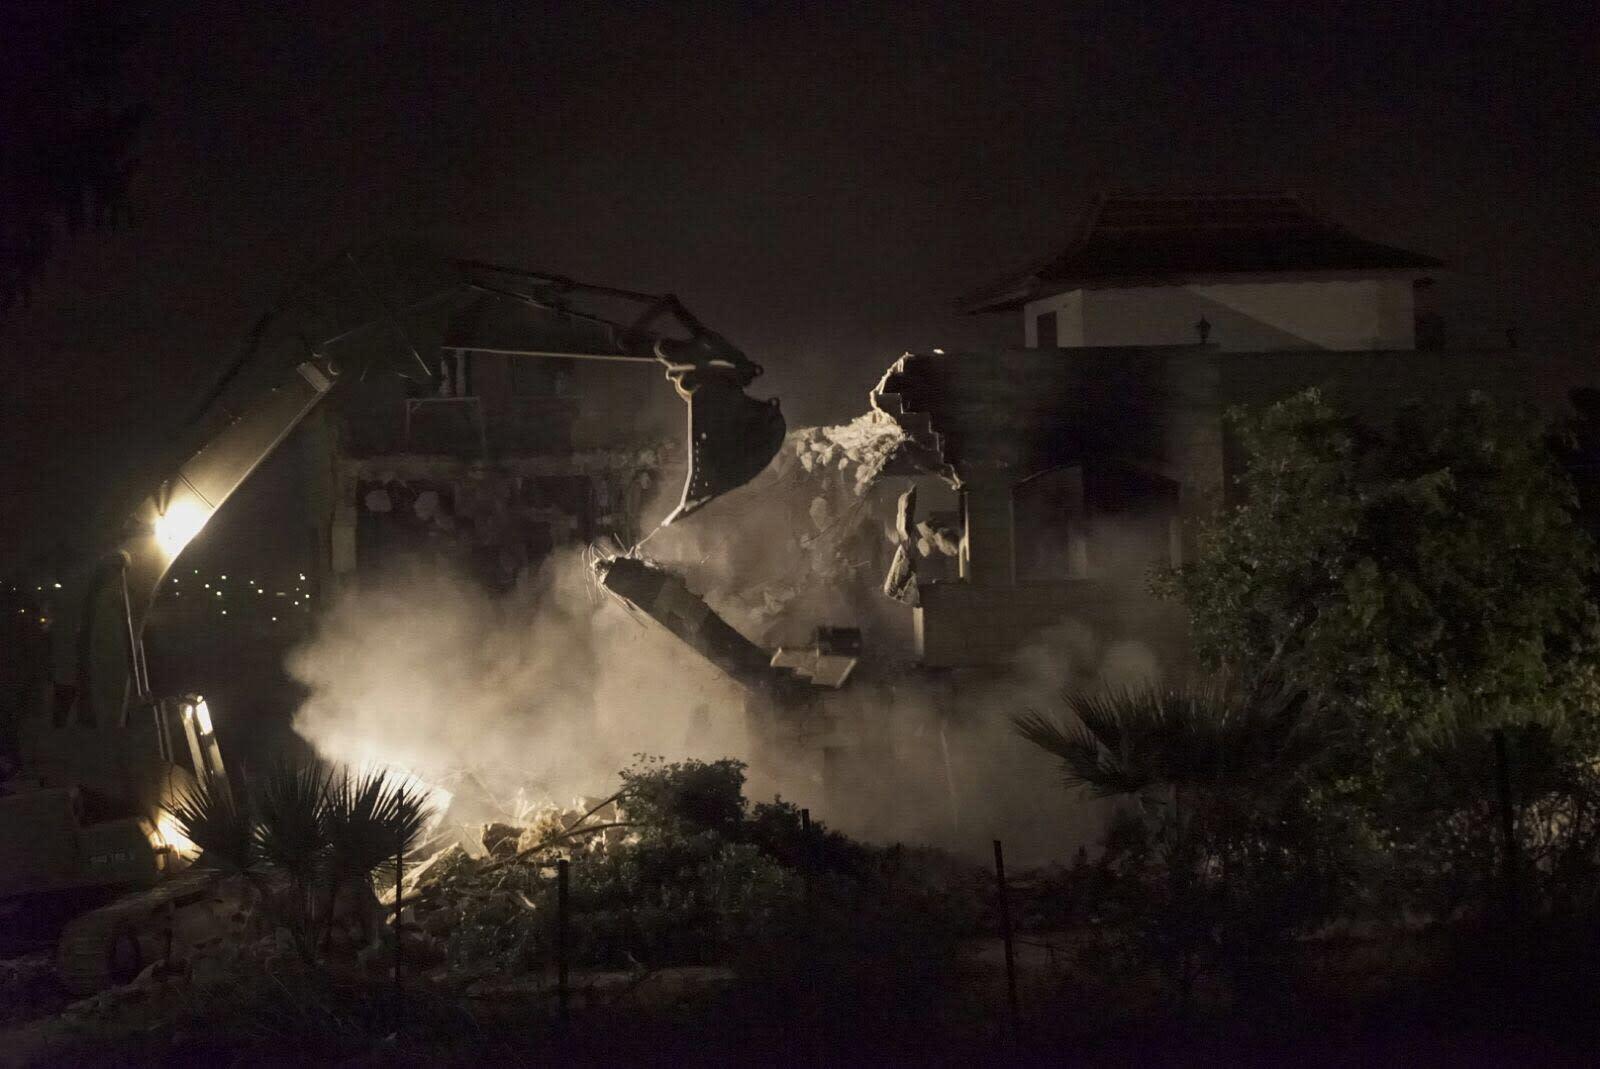 The IDF demolishes the home of Ahmad Nasser Jarrar, ringleader believed to be behind the Havat Gilad shooting. (IDF SPOKESPERSON'S UNIT)